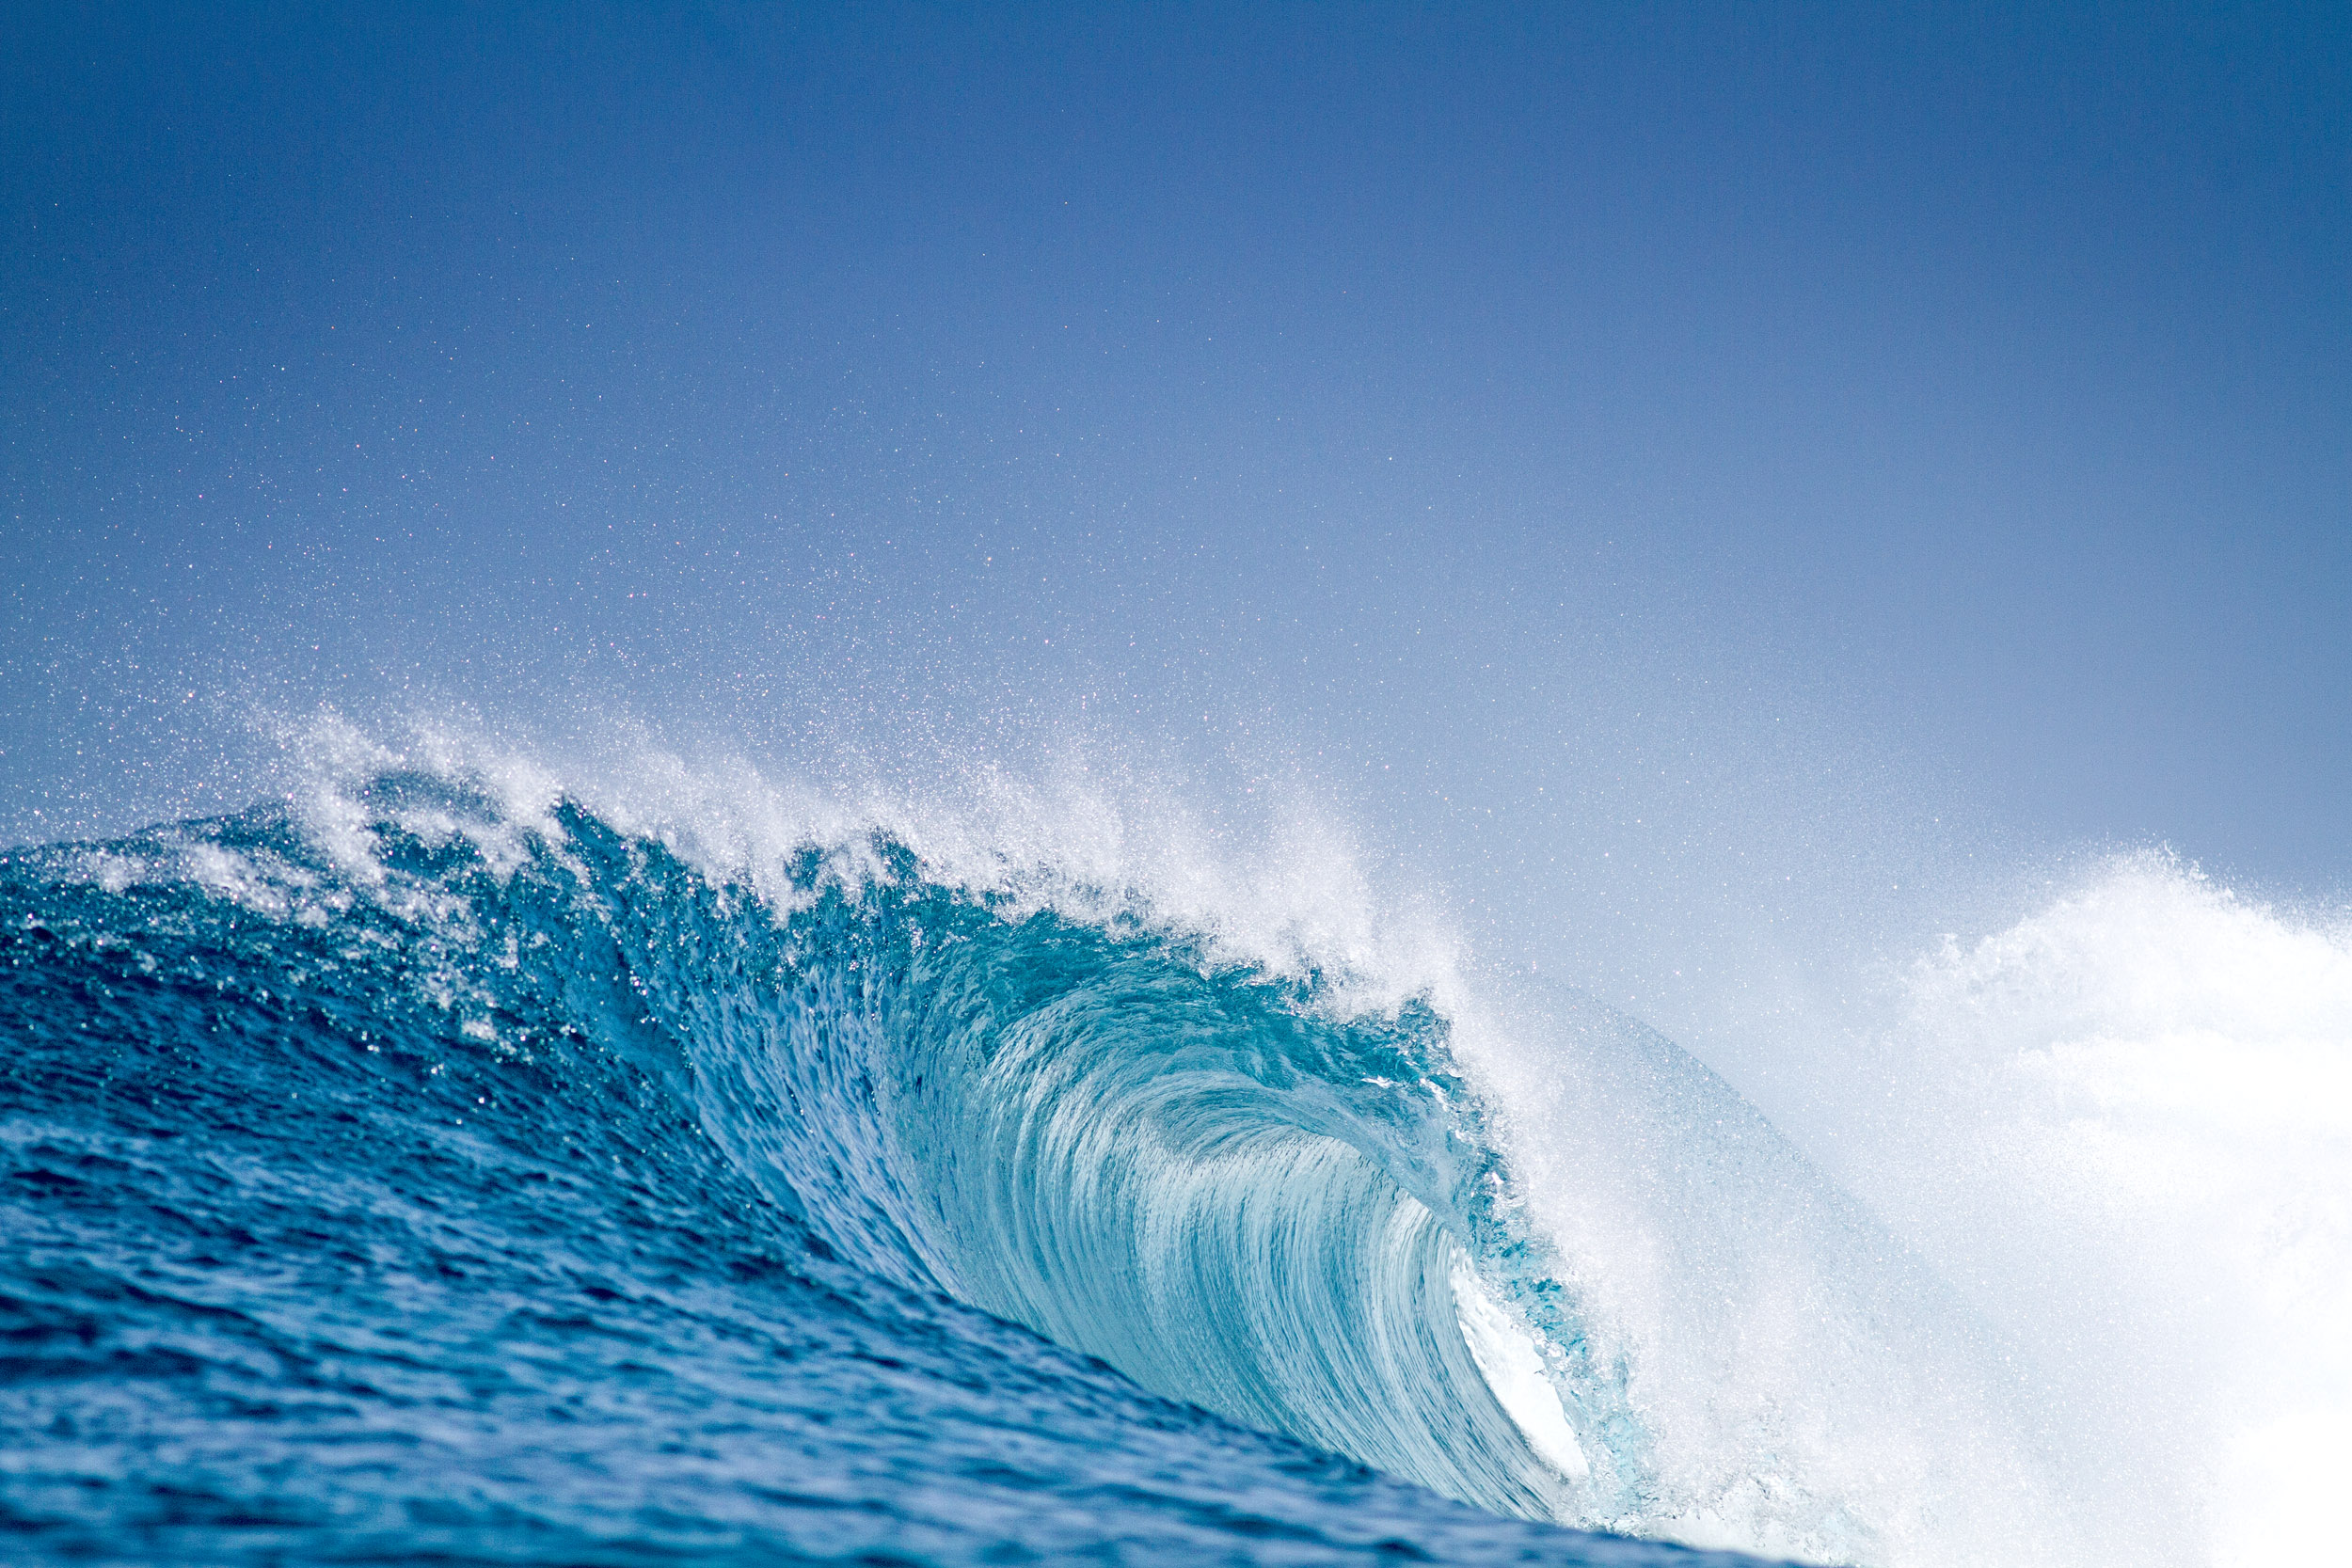 maldives-surf-photography-S928-551.jpg